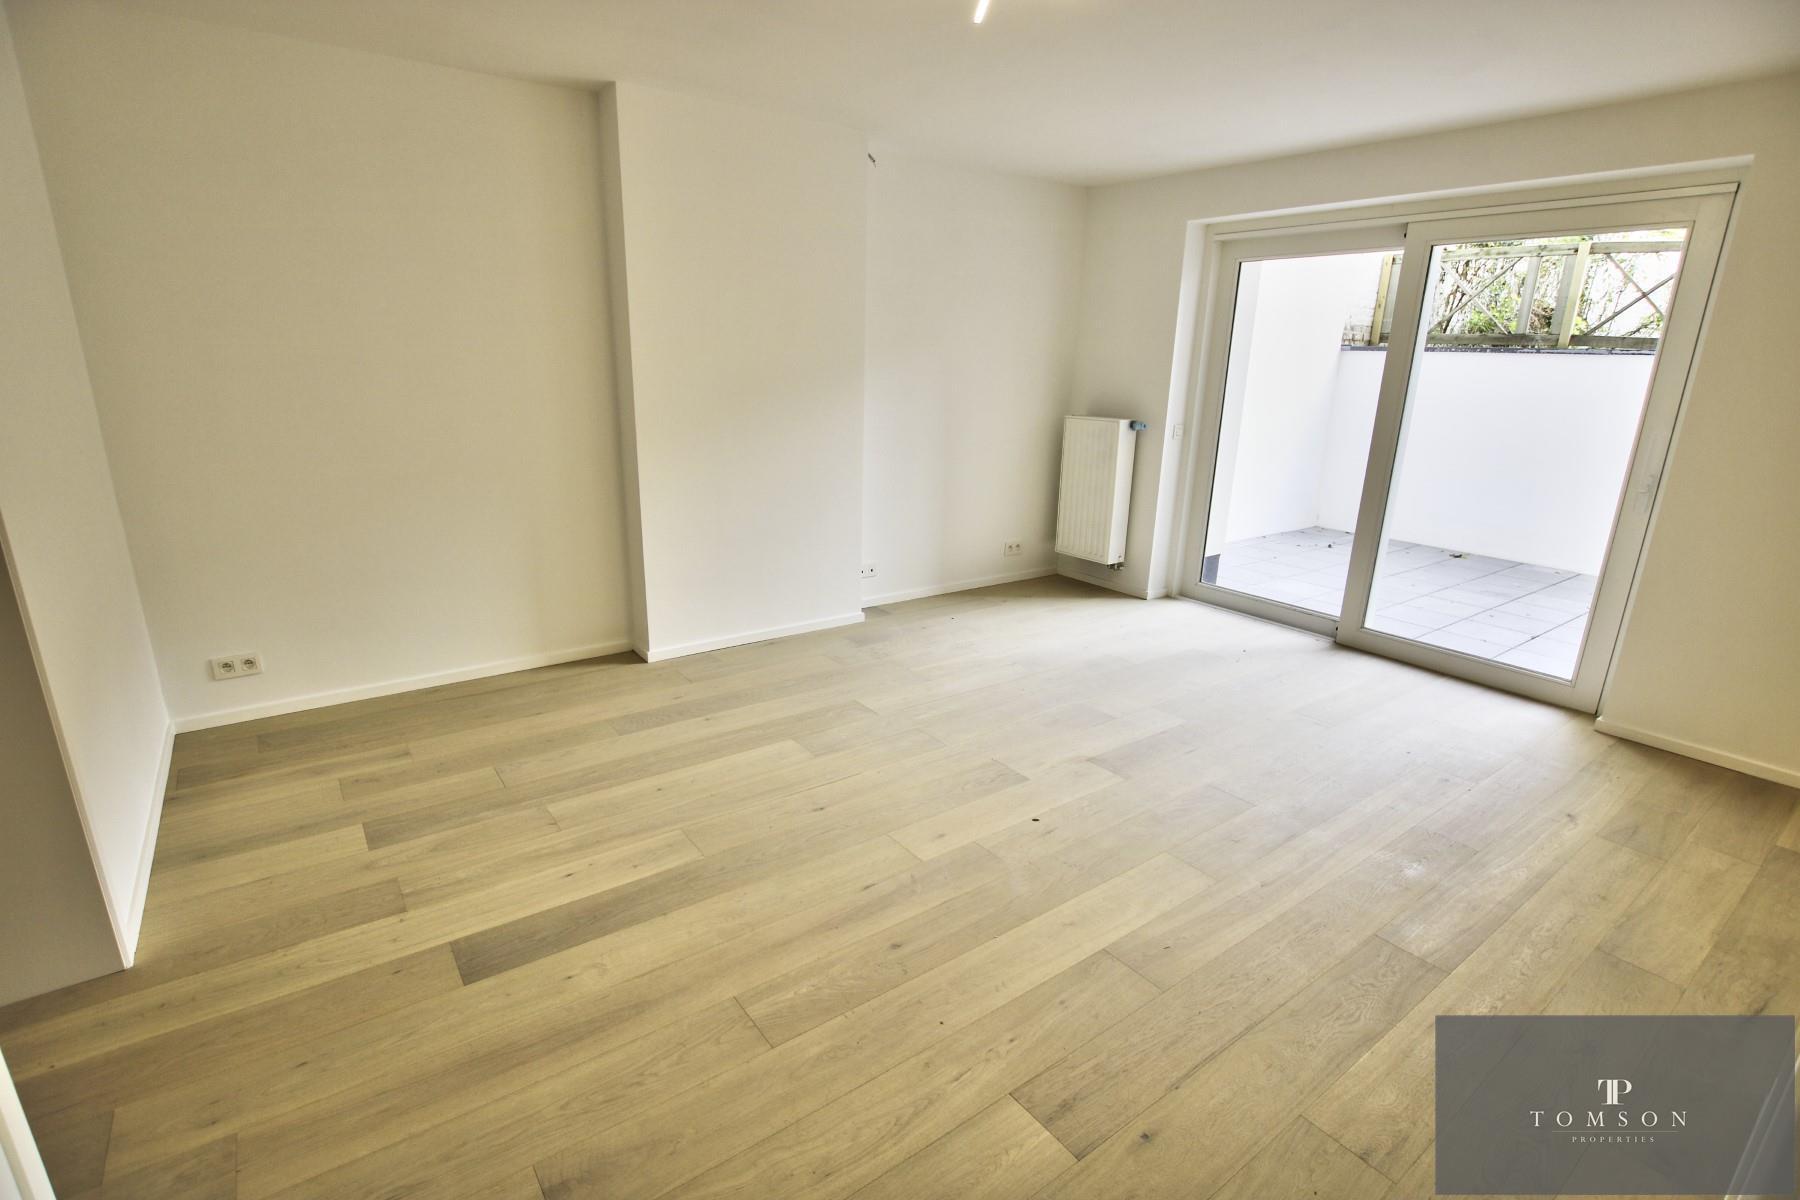 Flat - Etterbeek - #4431086-4